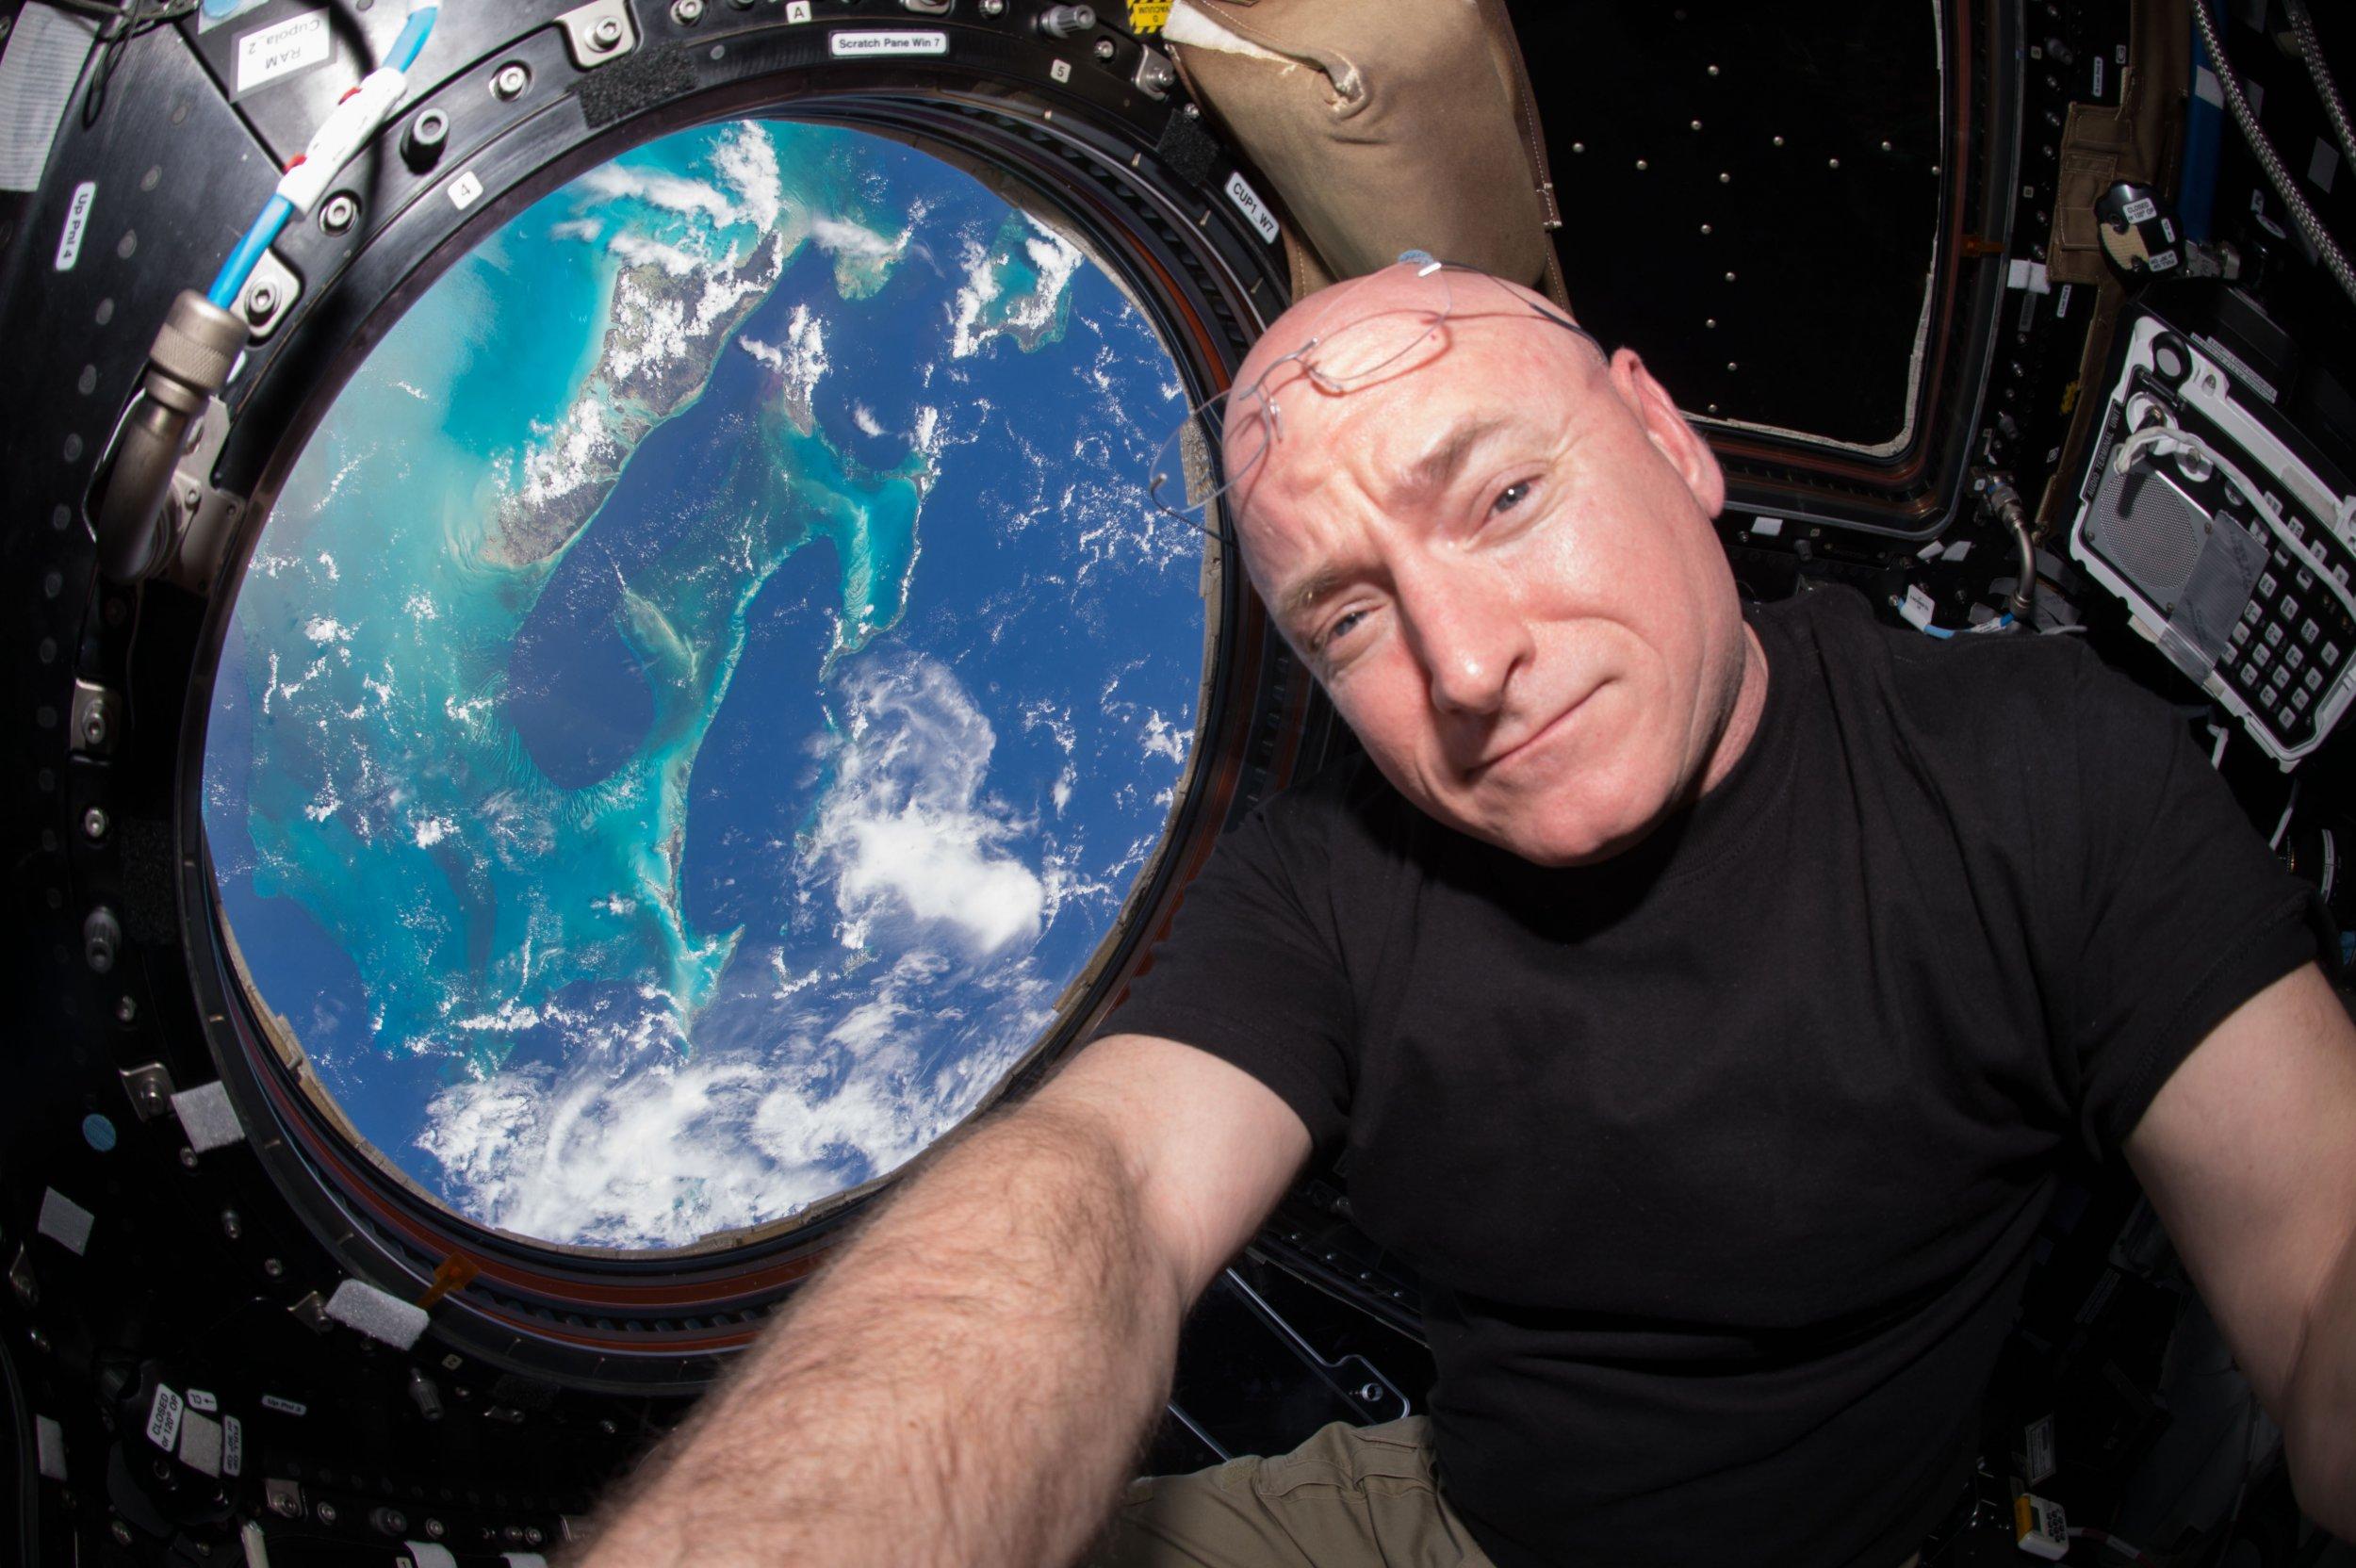 NASA astronaut Scott Kelly in space